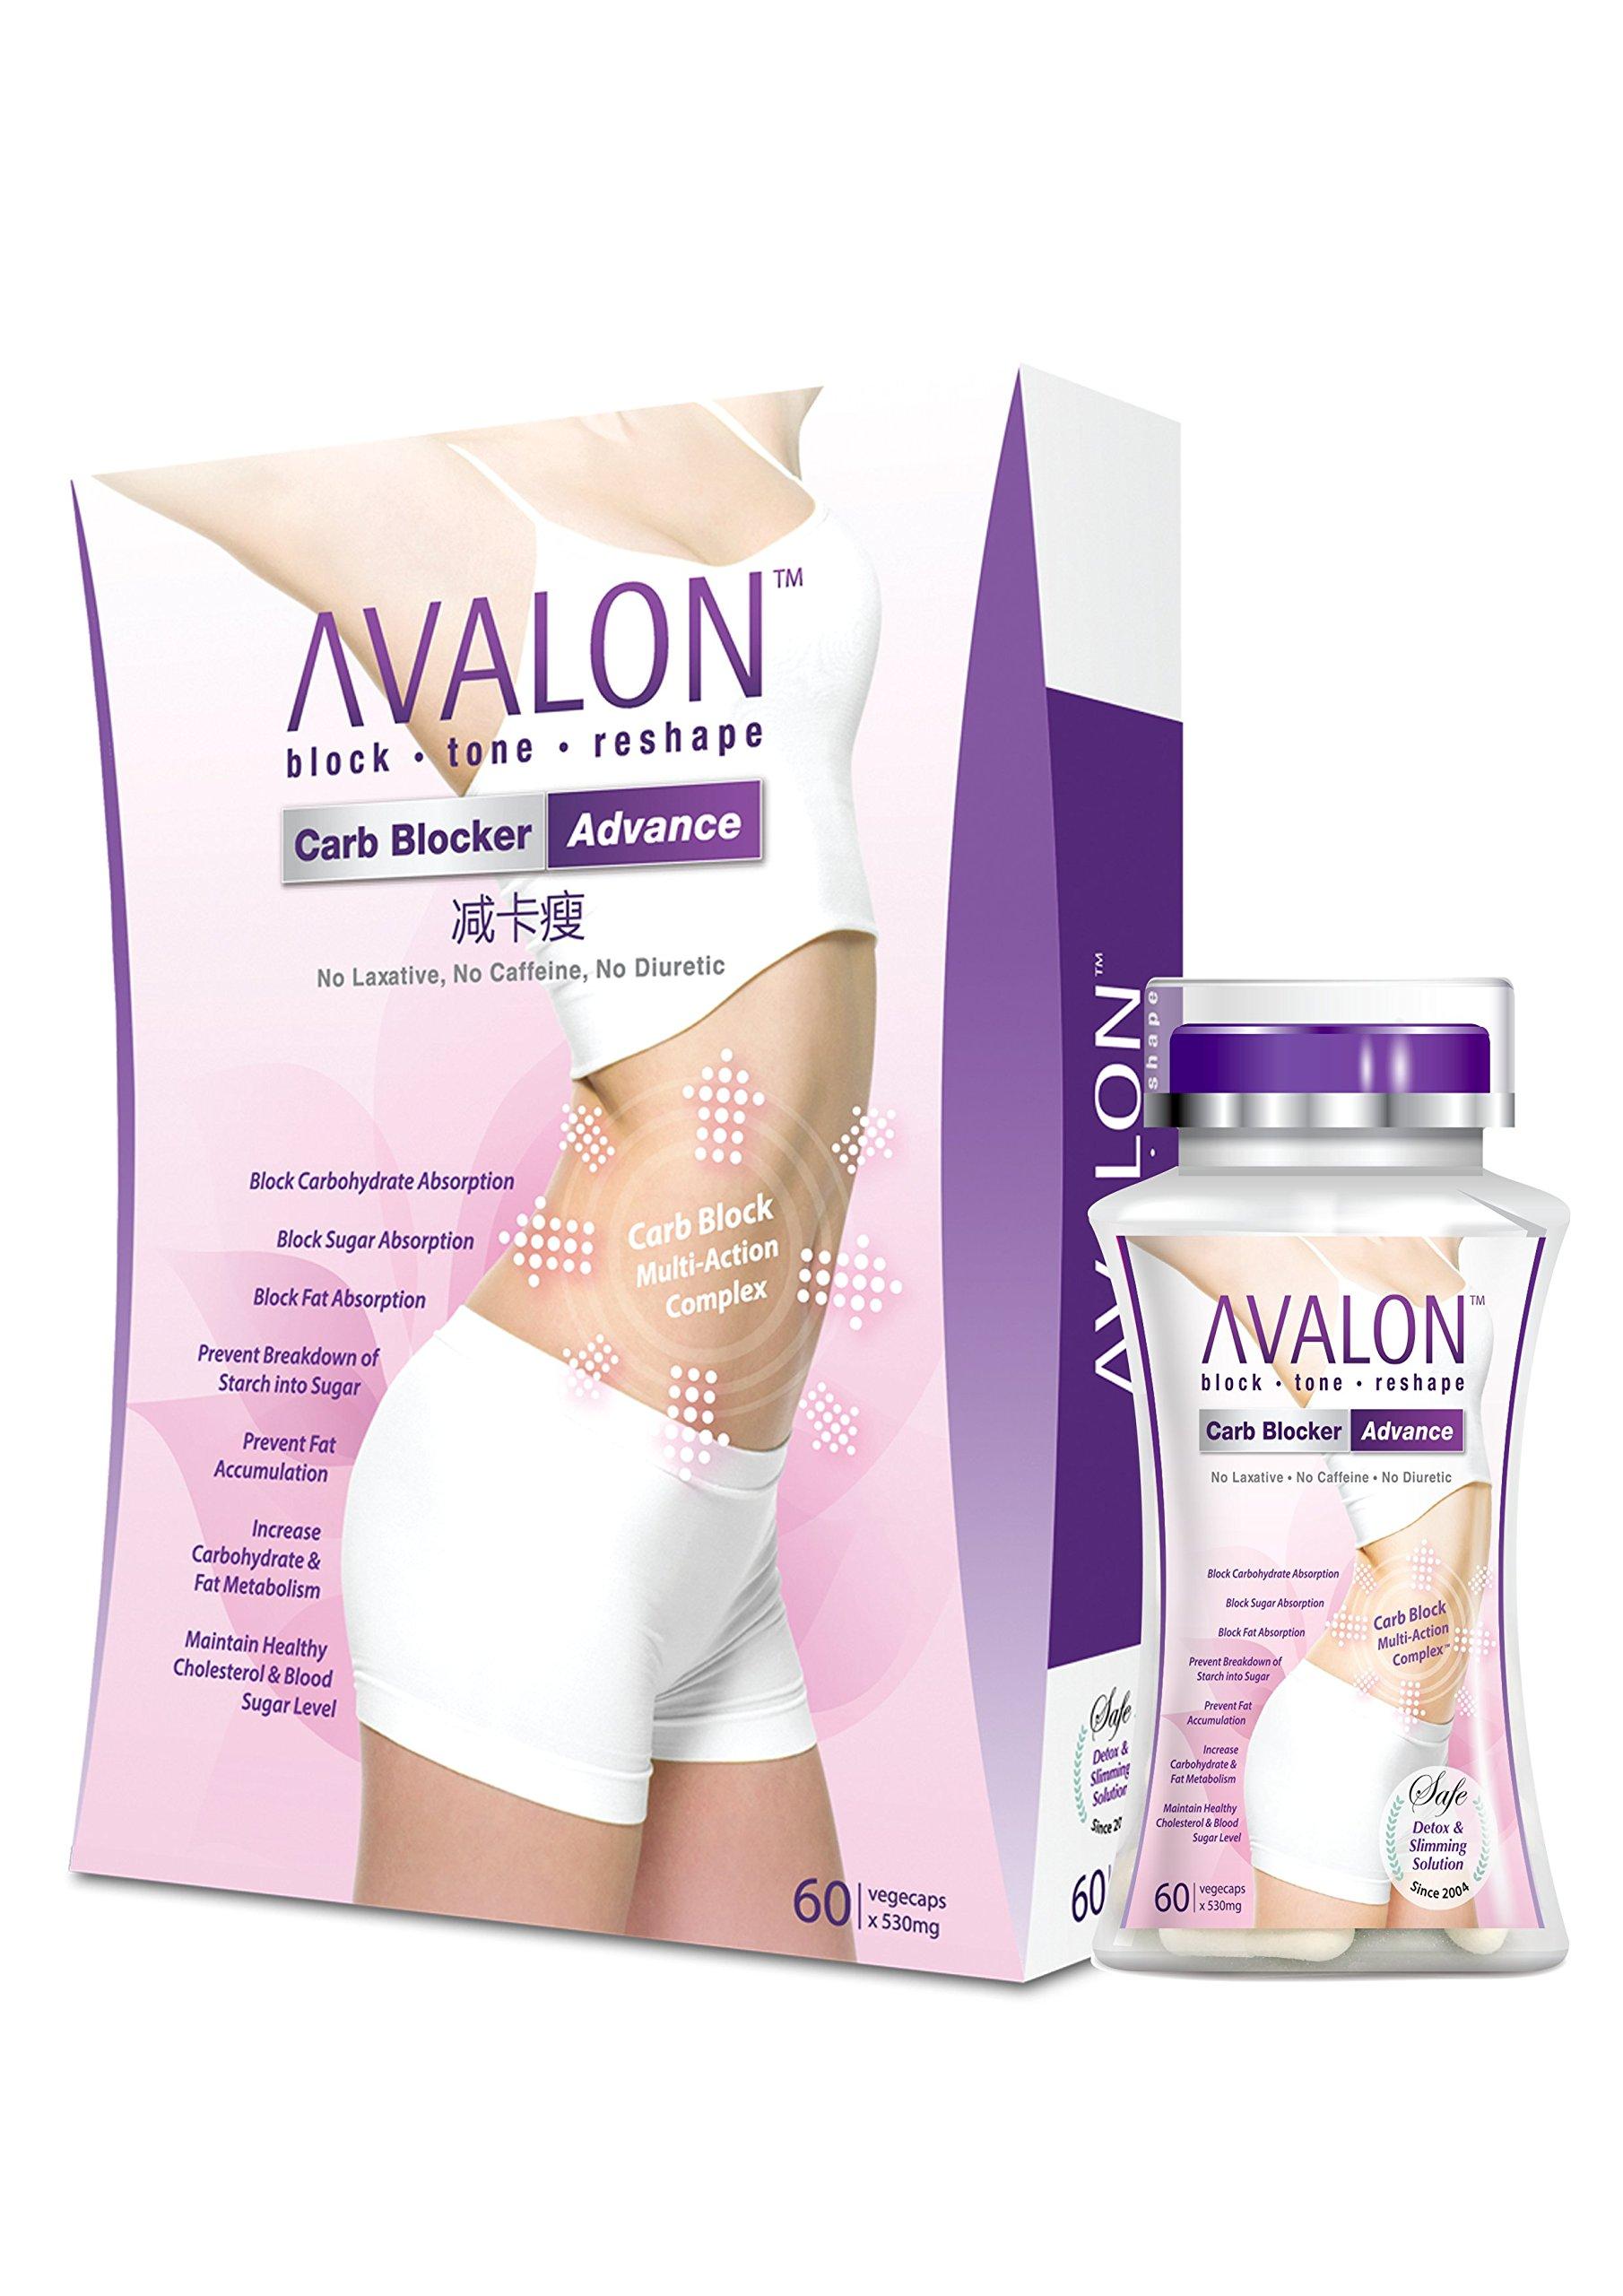 AvalonTM Carb Blocker Advance • Block, Tone, Reshape • No Laxative, No Caffeine, No Diuretic • Vegetarian Certified • 60 Capsules